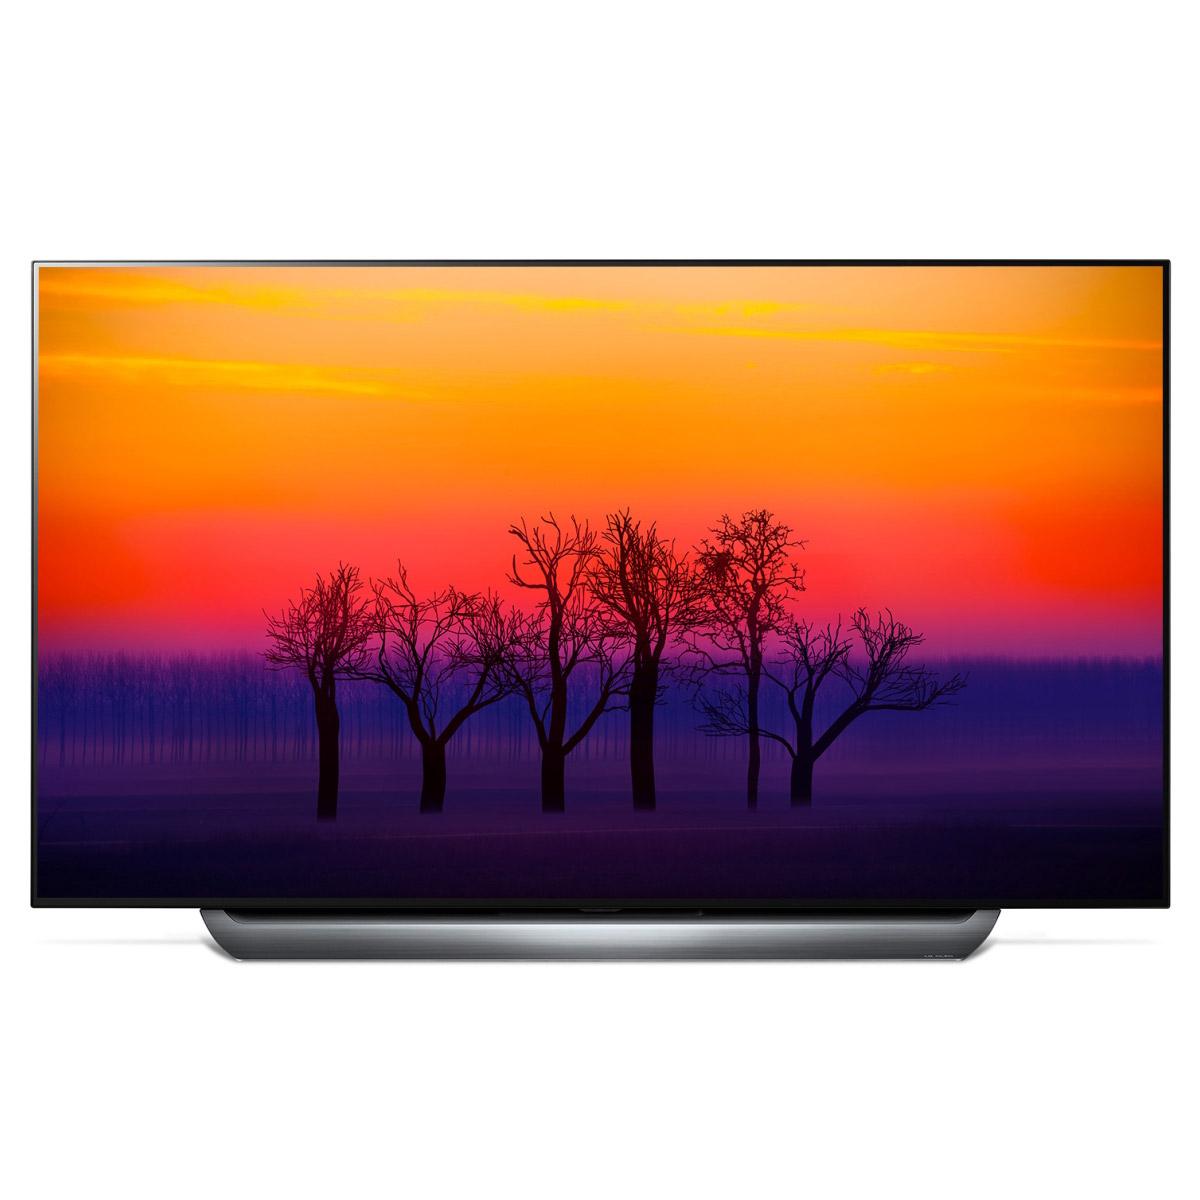 "TV OLED 55"" LG OLED55C8 - 4K UHD, HDR, Smart TV (avec ODR 200€)"